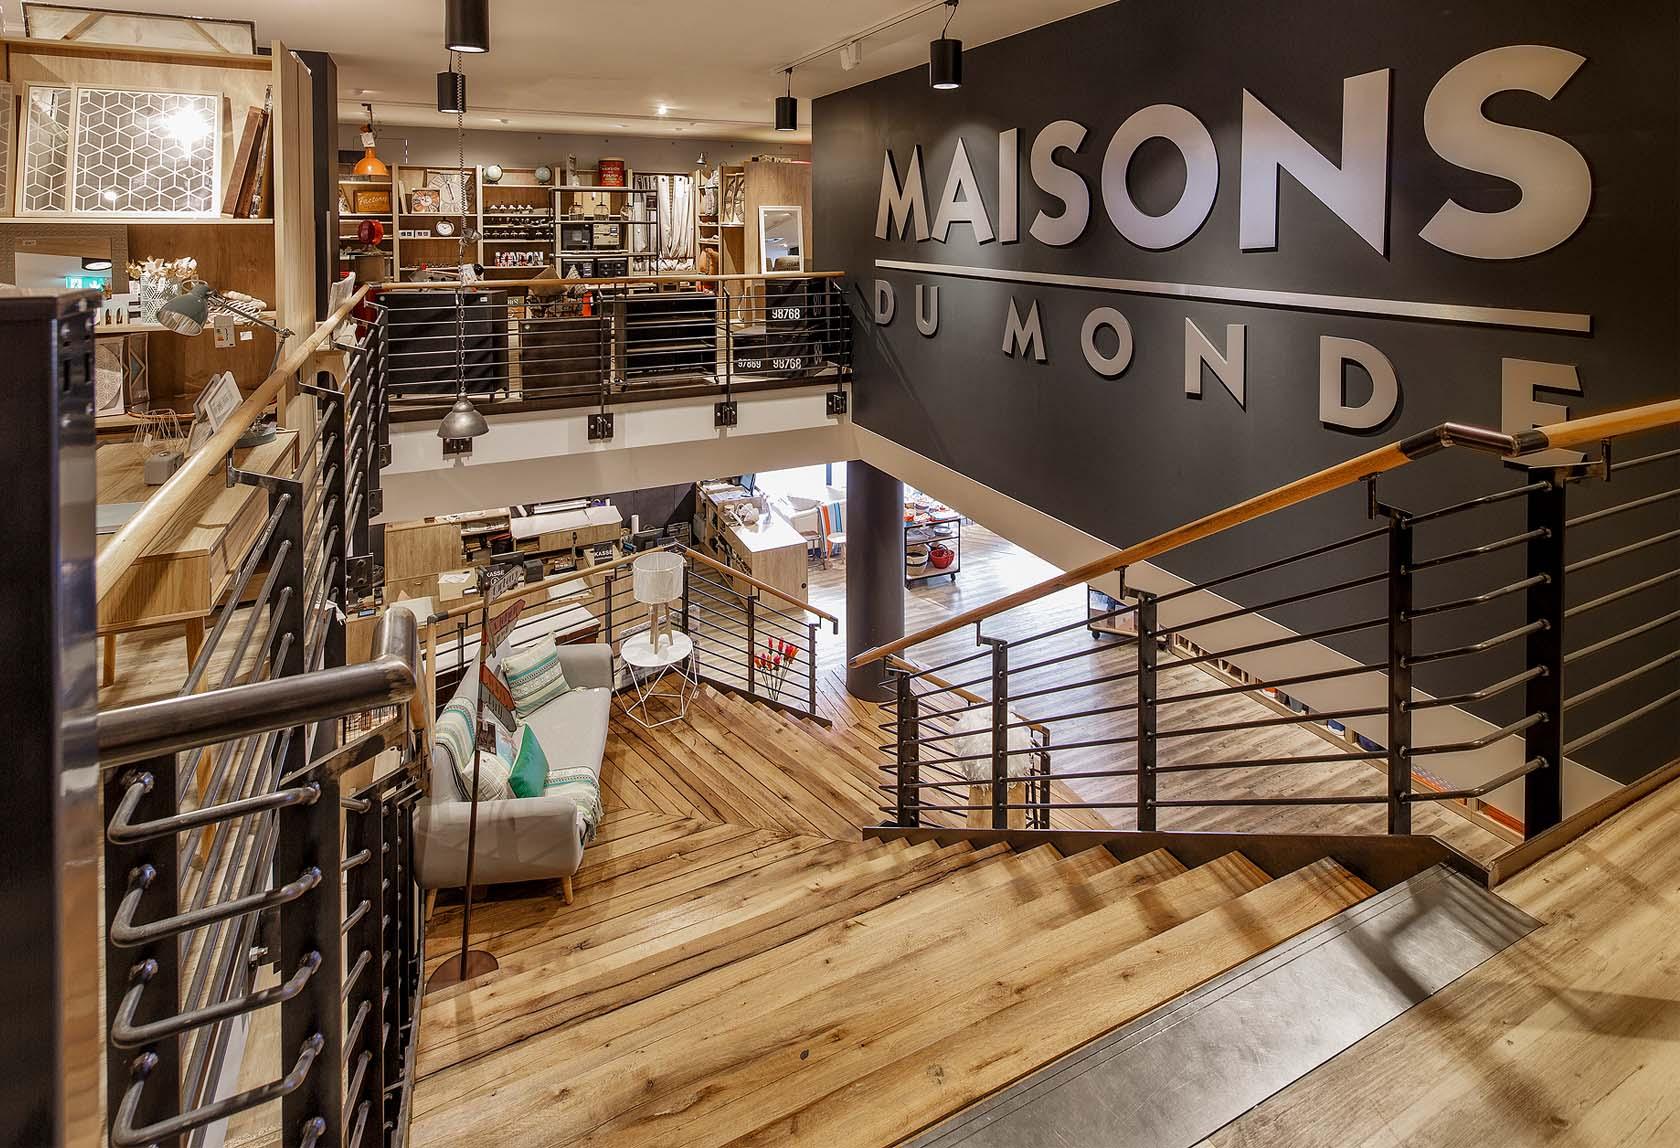 MAISONS DU MONDE store in Dortmund Germany  SAM l MAU architecture